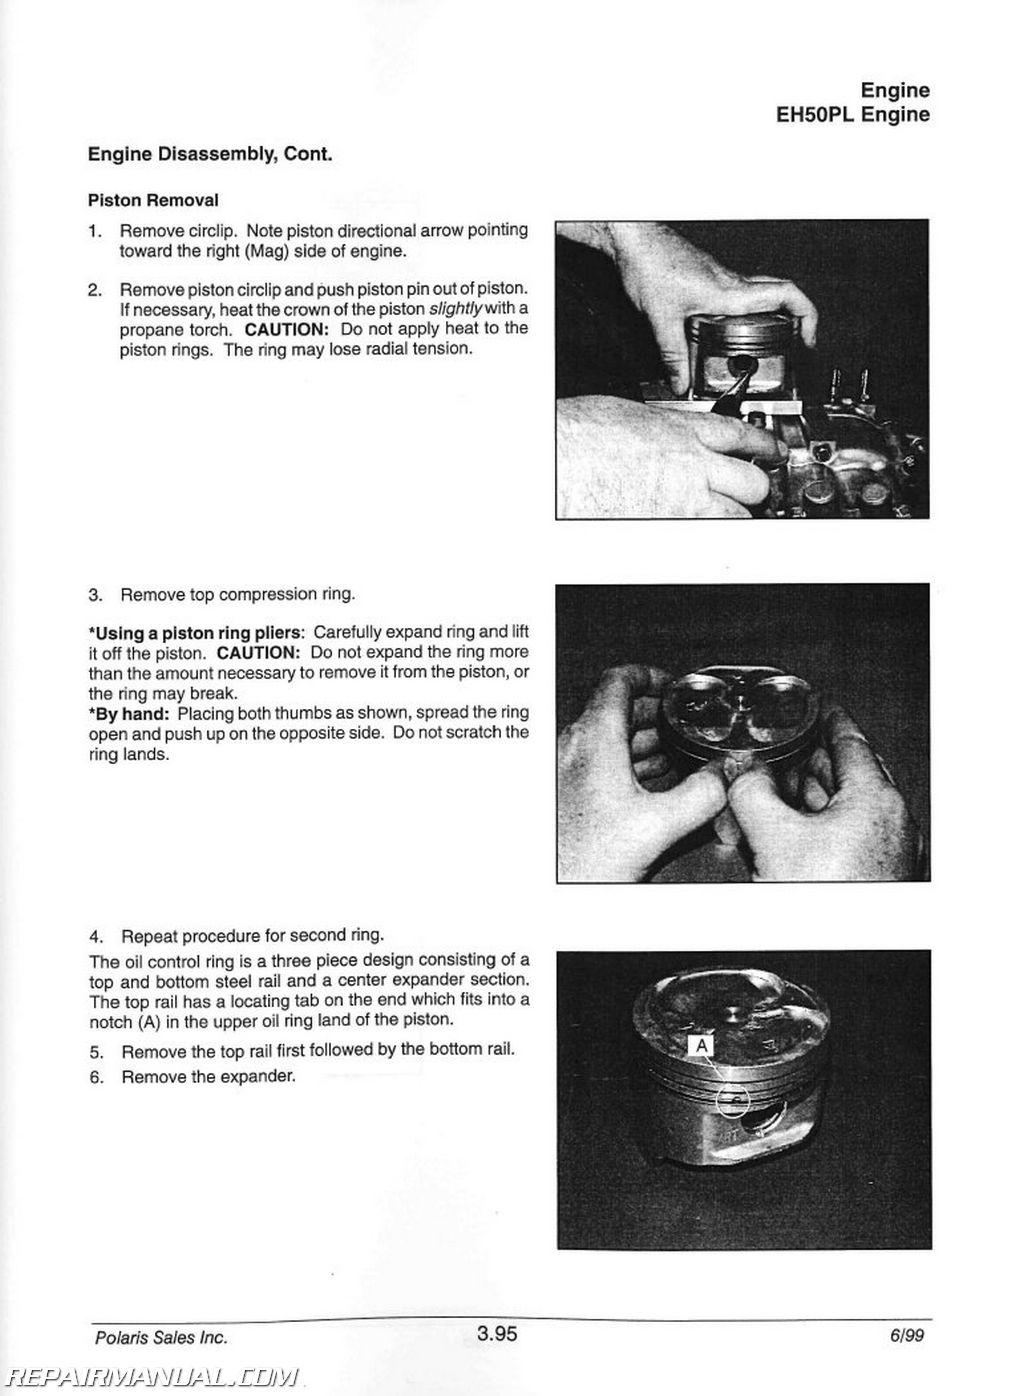 Wrg-6242] 2000 polaris magnum 325 owners manual | 2019 ebook library.